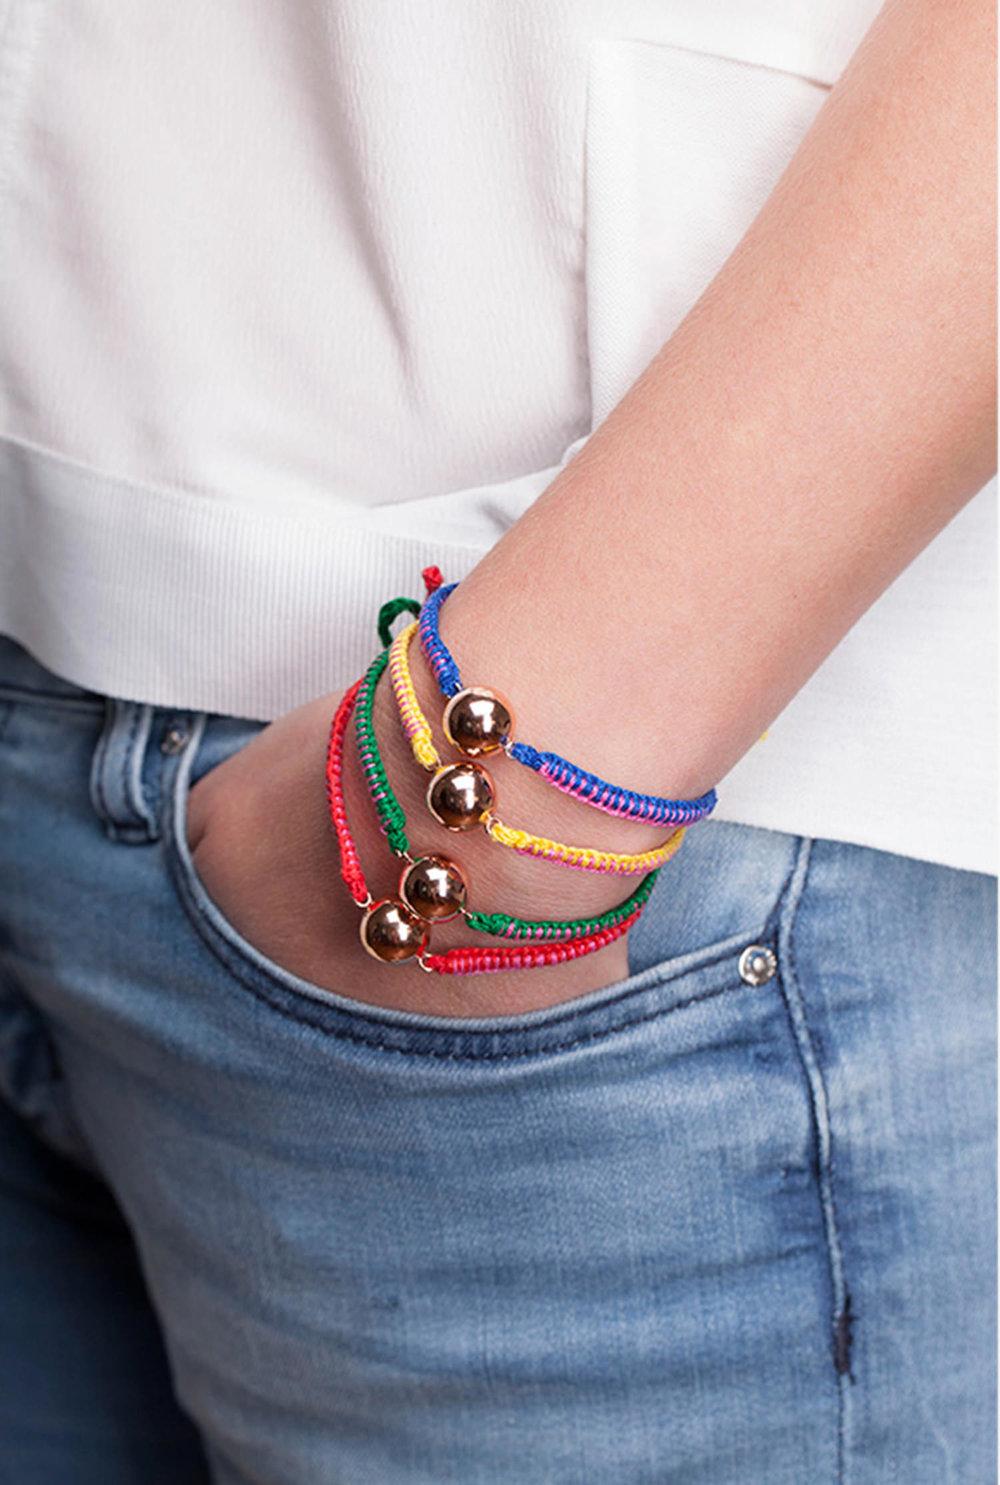 Aimee Betts-Ilado-Bola Bracelet 001.jpg